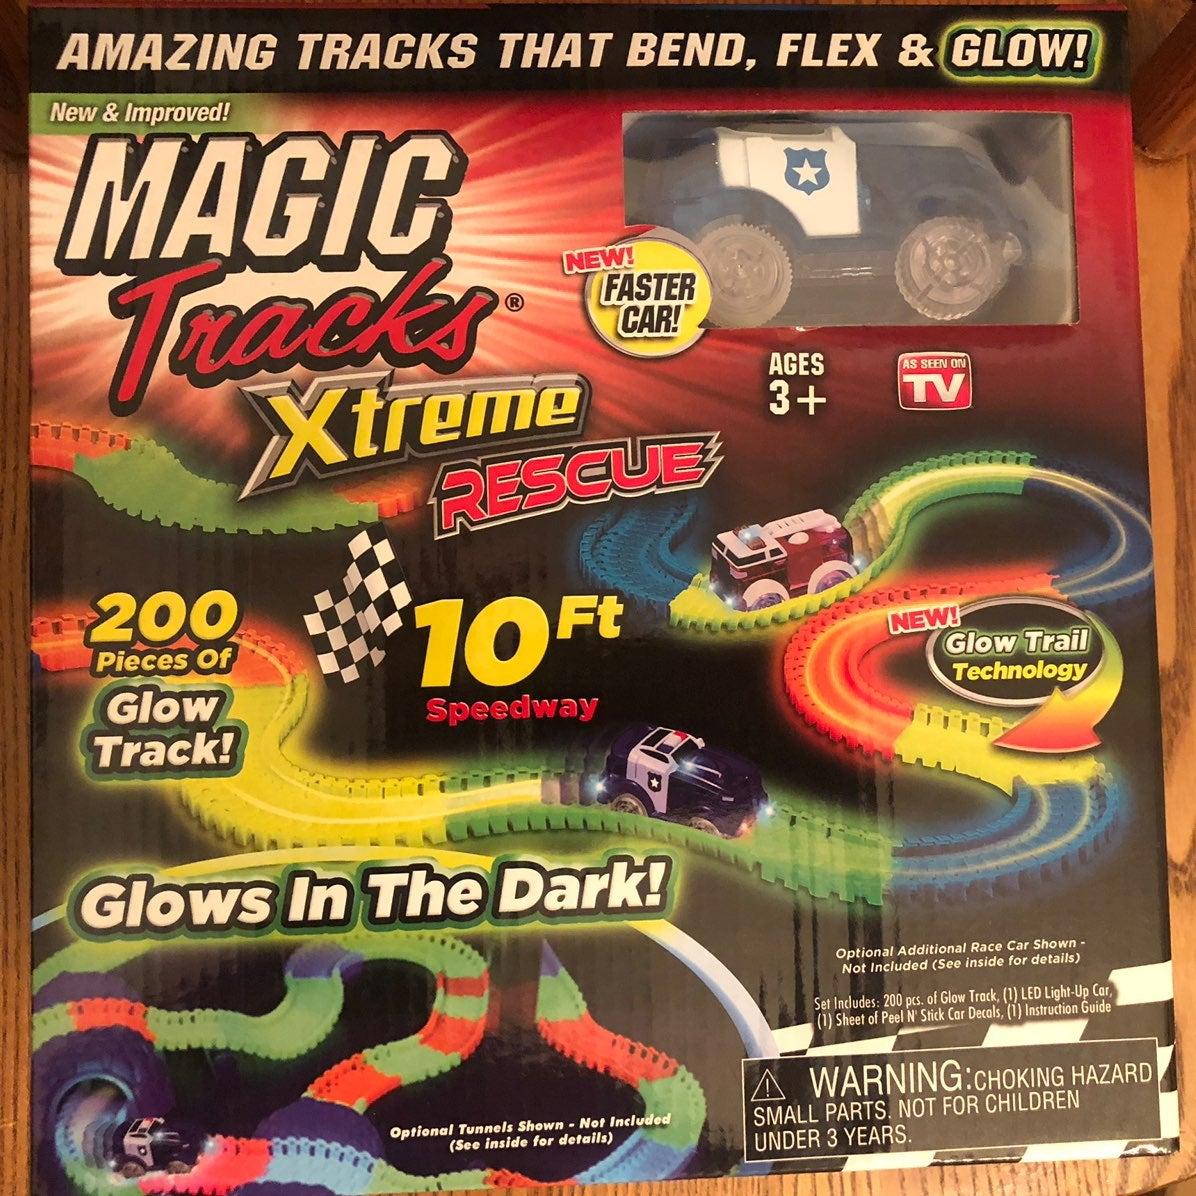 MAGIC TRACKS XTREME RESCUE